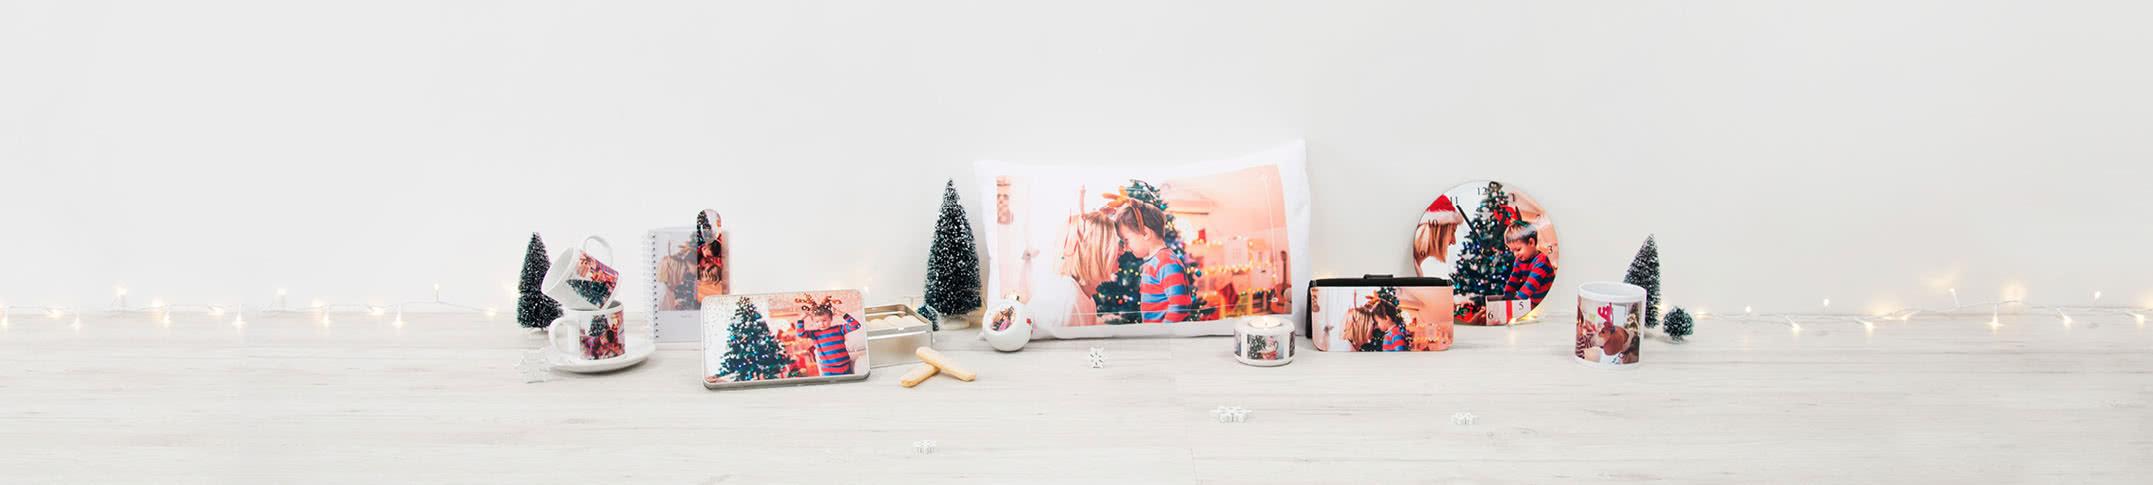 cadeau de no l femme personnalis 200 id es cadeaux femme. Black Bedroom Furniture Sets. Home Design Ideas